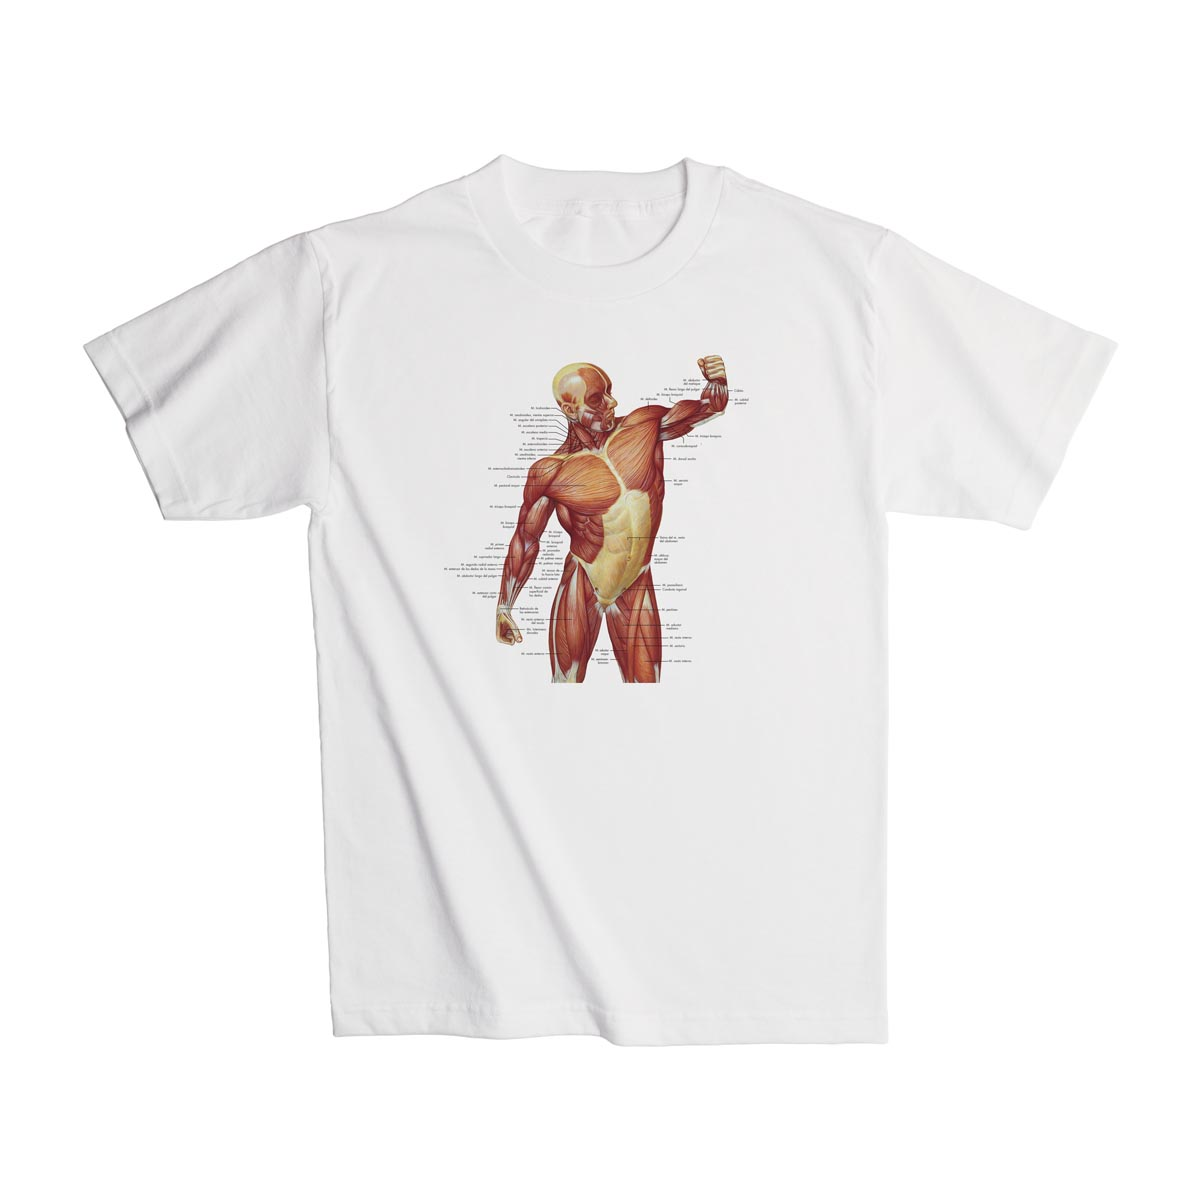 Geek Gifts - Geek T-Shirts - Geek Tees - Anatomy Shirts - Science ...